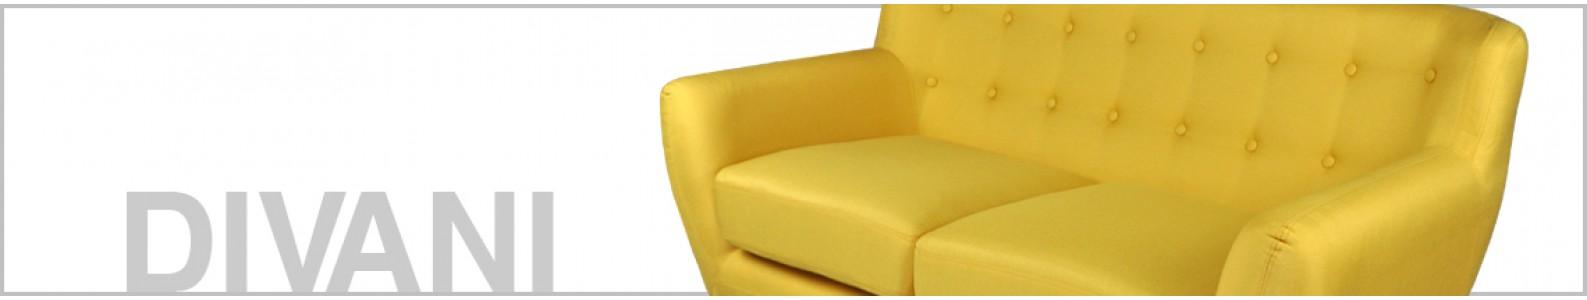 Divano 2 posti in tessuto giallo dallo stile scandinavo mod. Emily Arredo